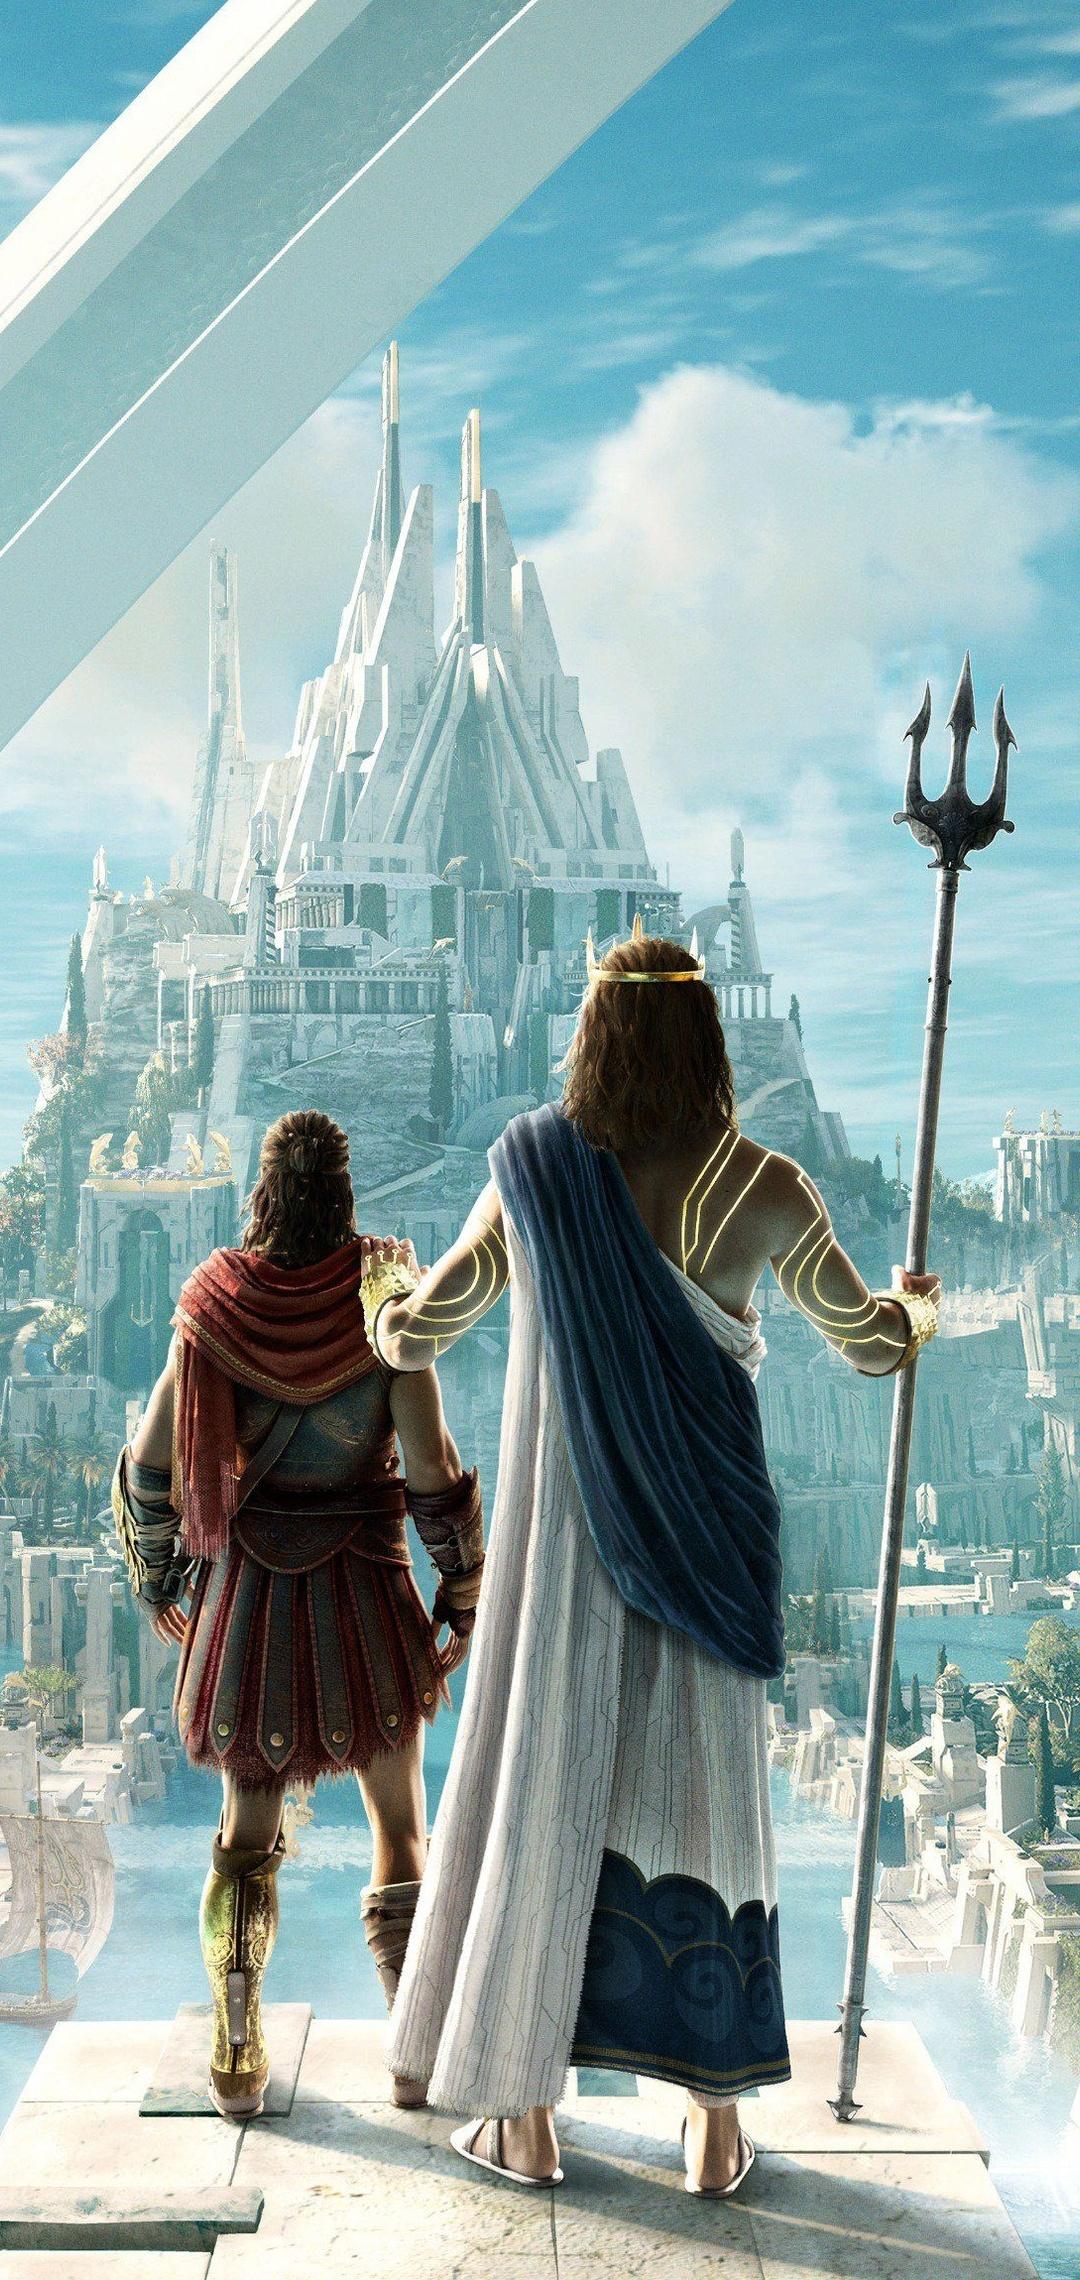 assassins-creed-odyssey-the-fate-of-atlantis-episode-3-4k-m2.jpg